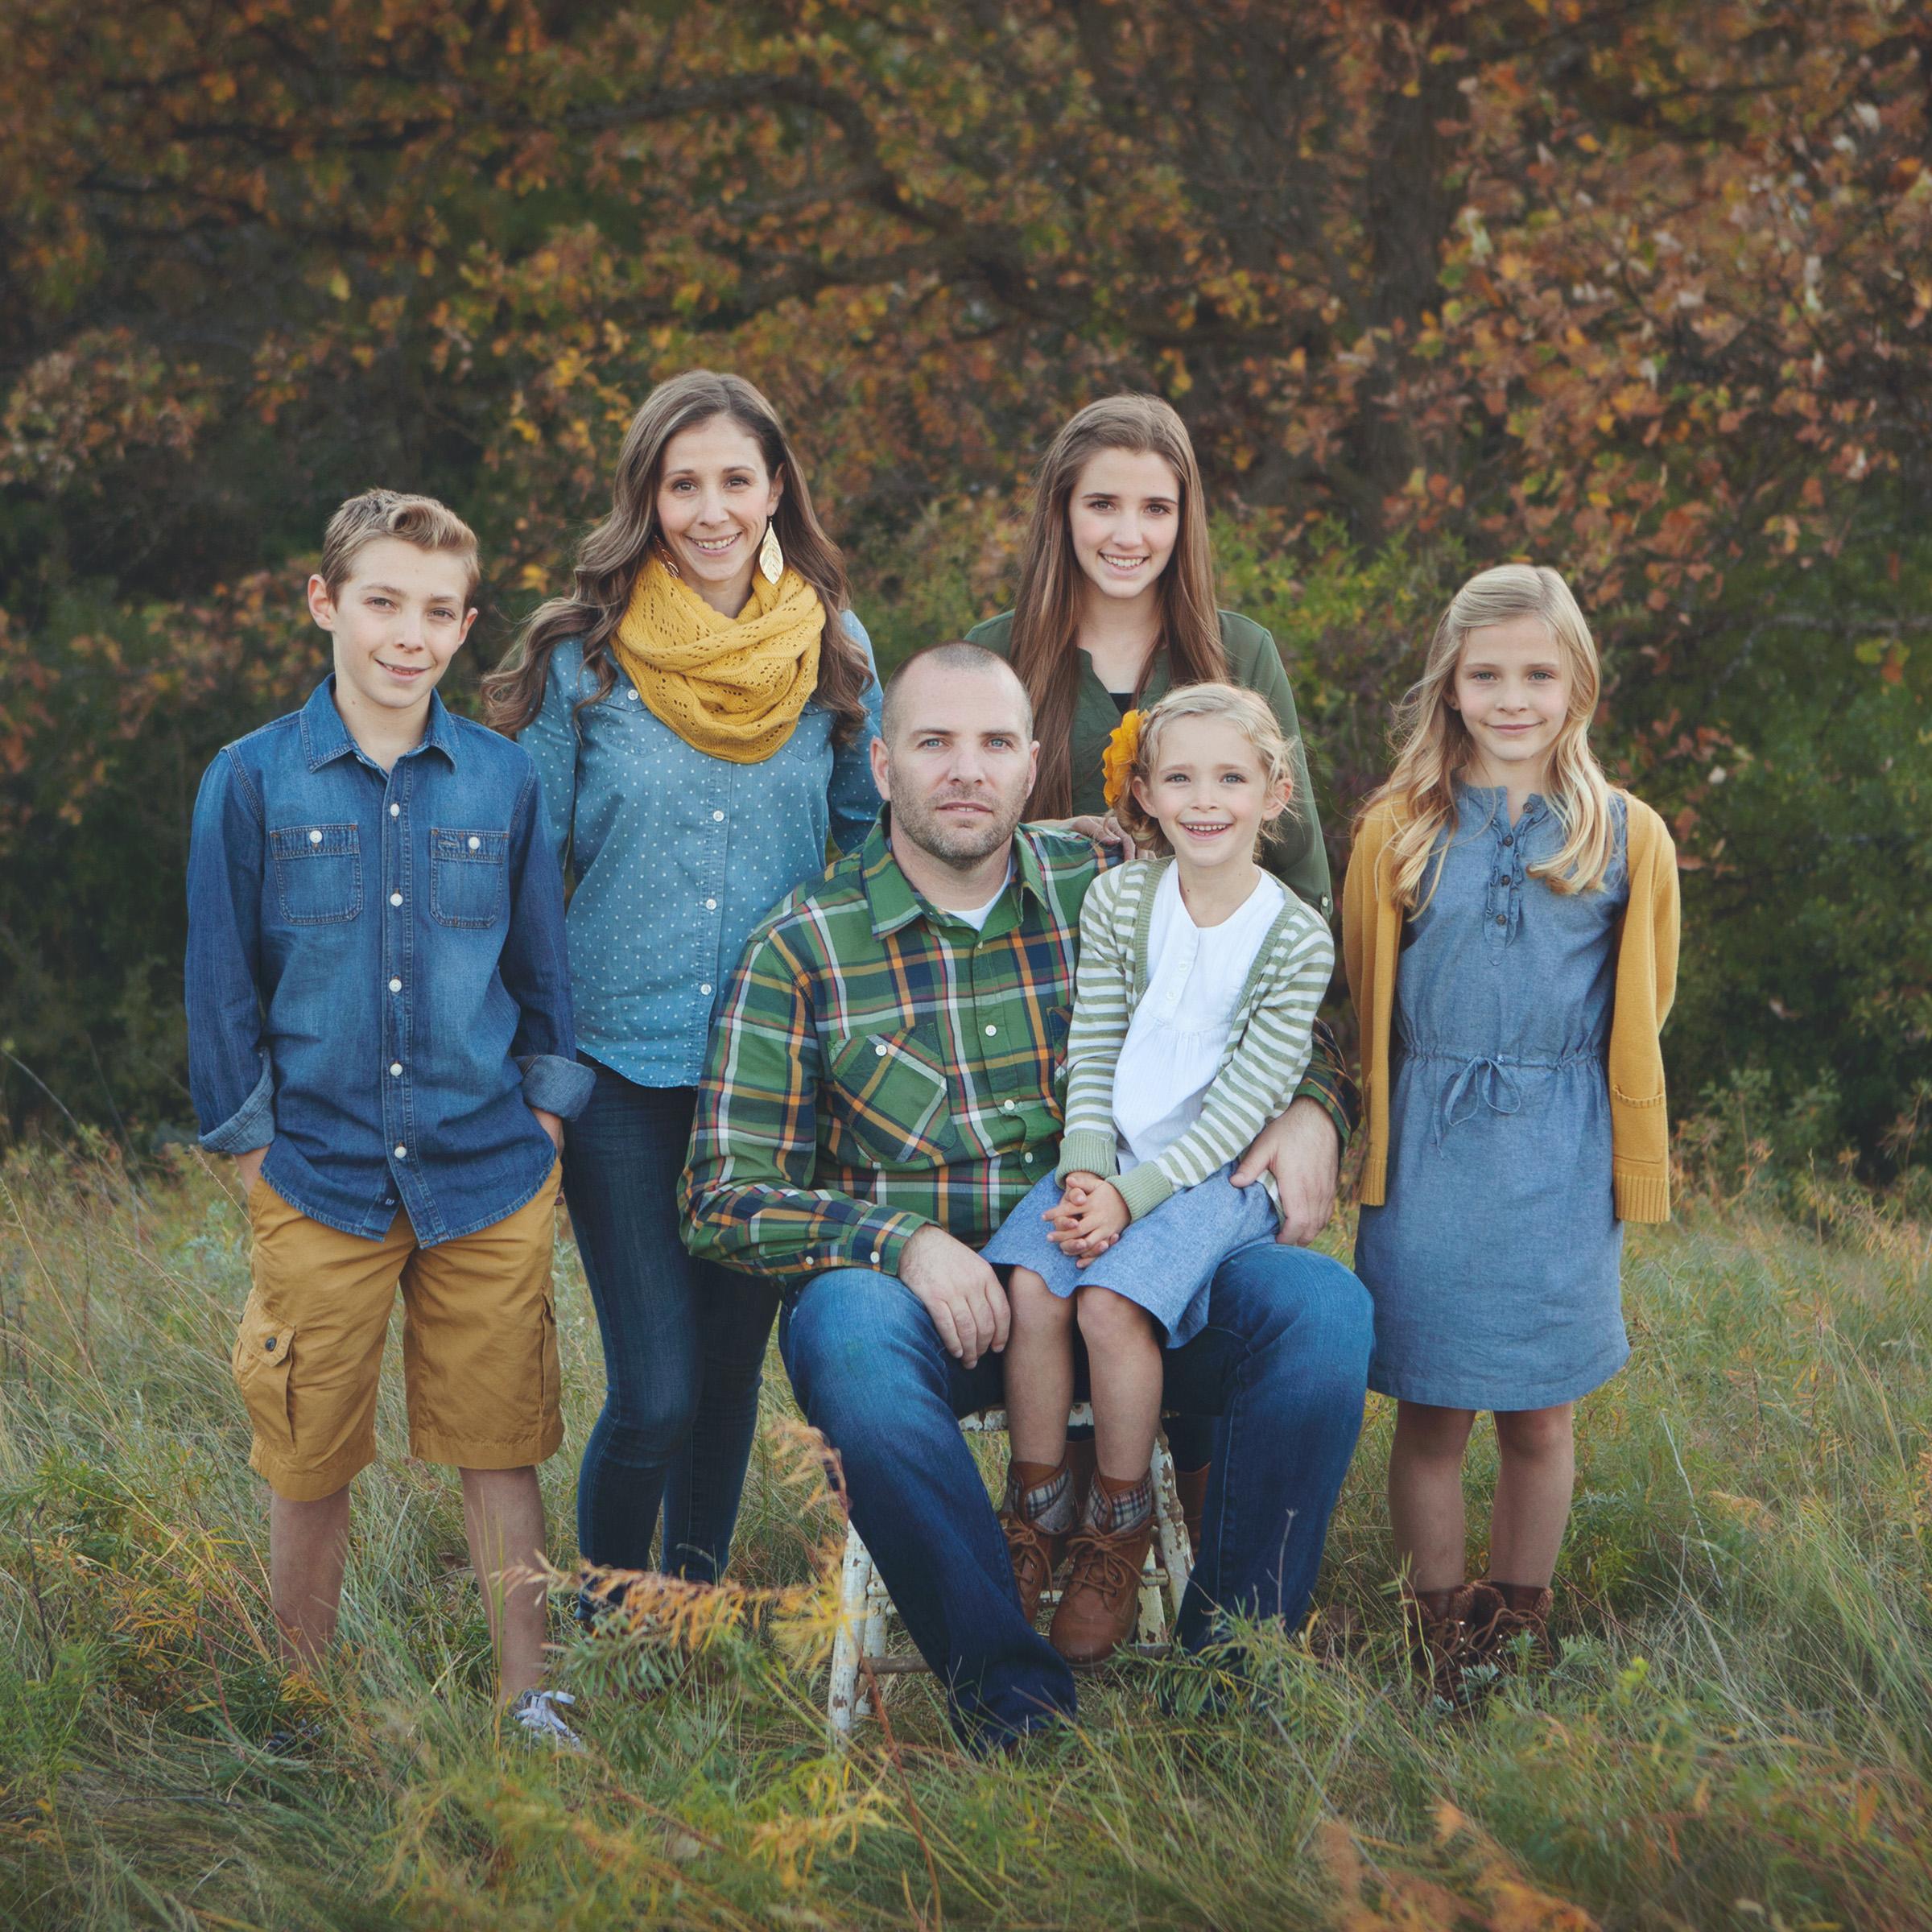 familyphotosig